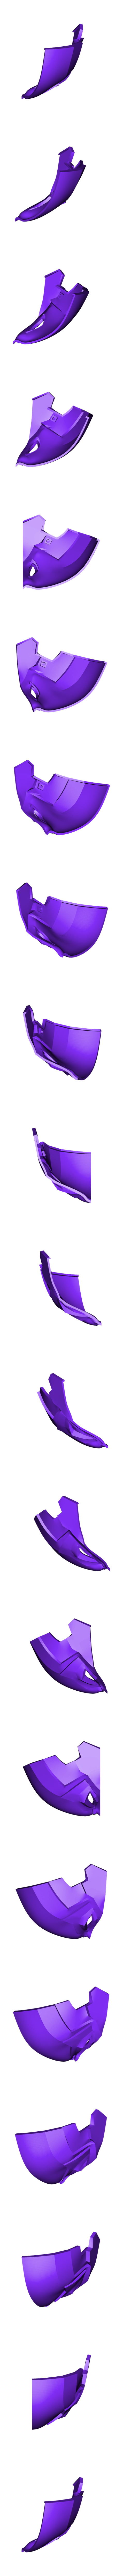 Two Eyes Part 2.stl Download STL file Deathstroke Injustice Helmet • 3D printable model, VillainousPropShop